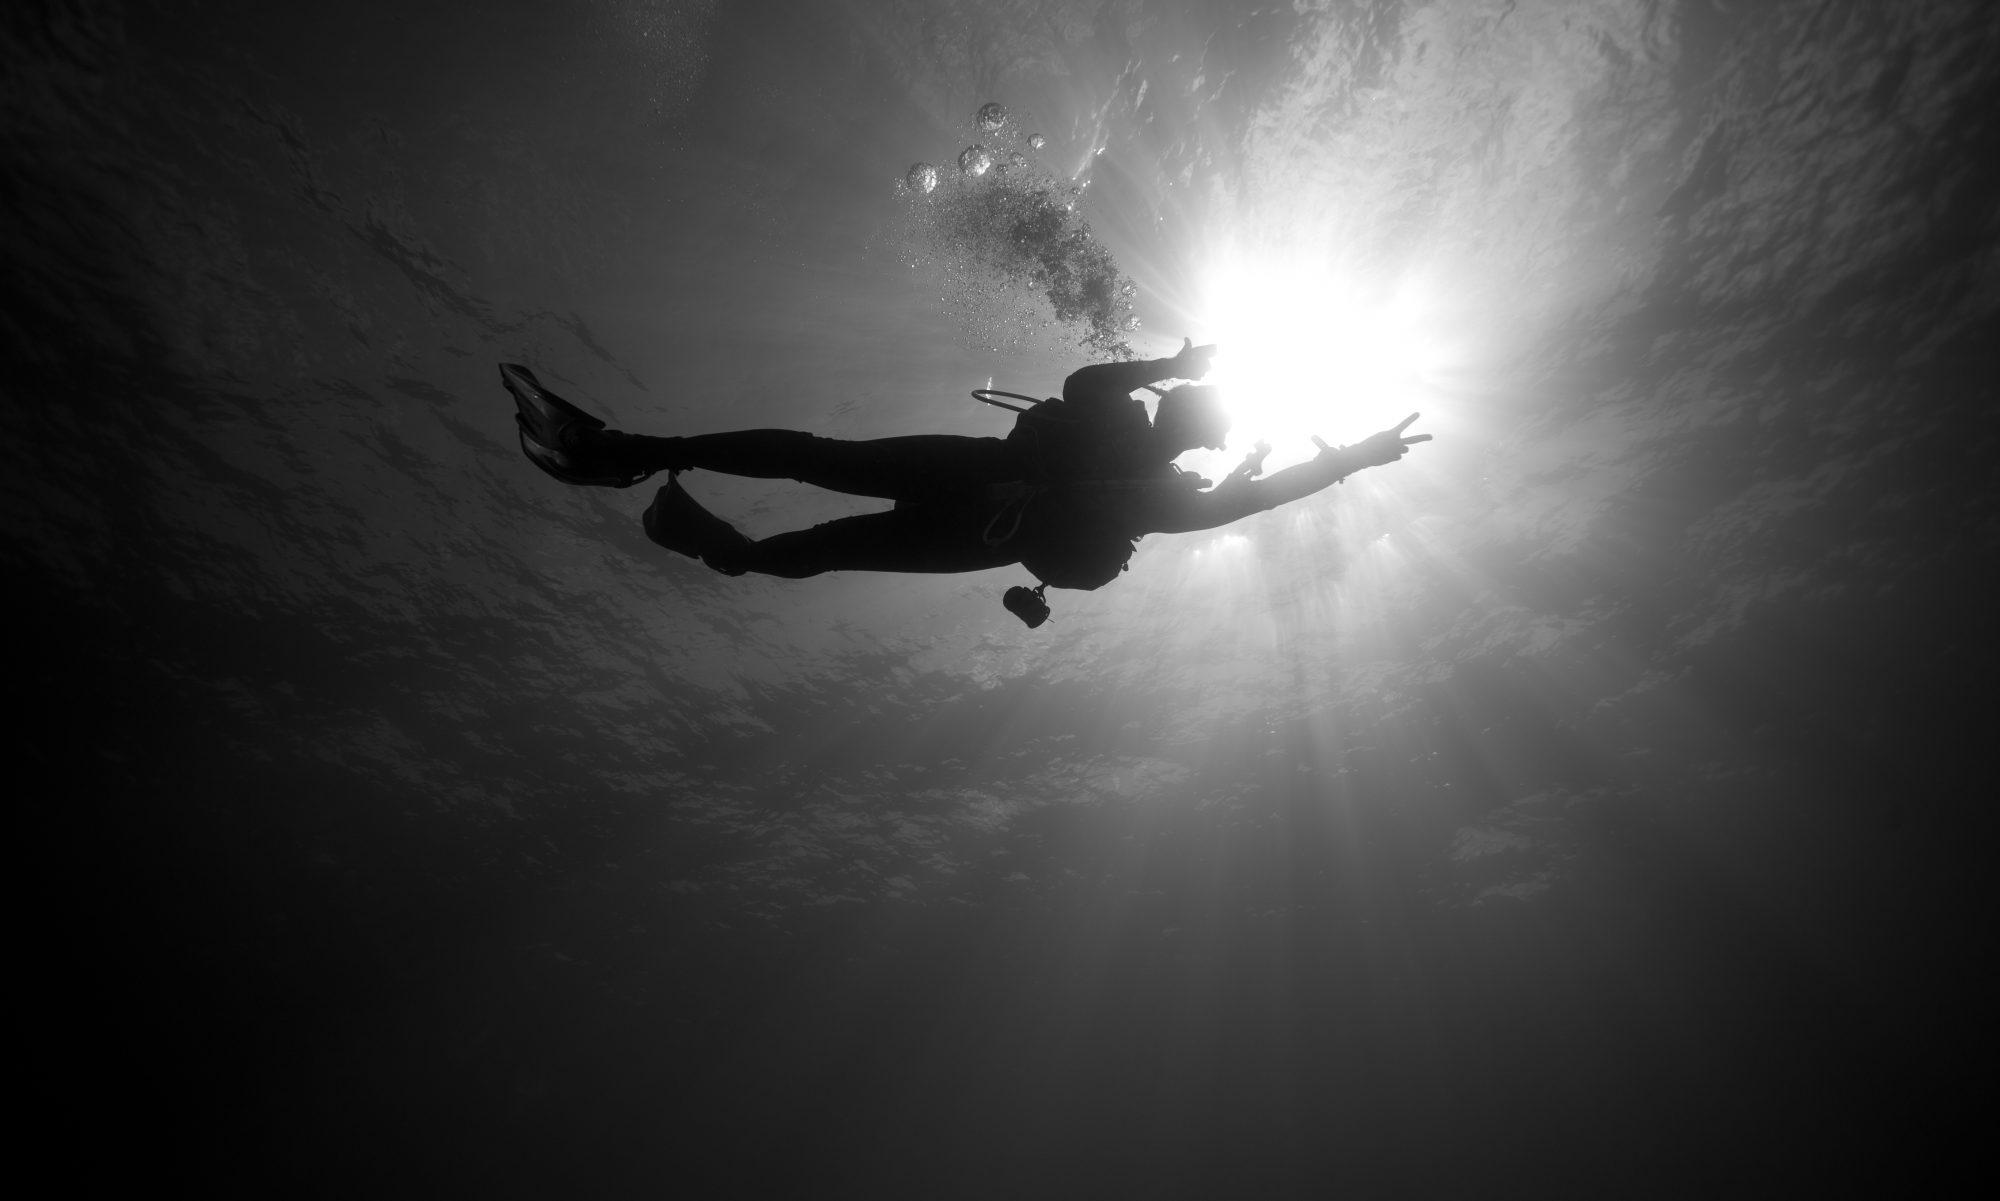 Sunchaser scuba